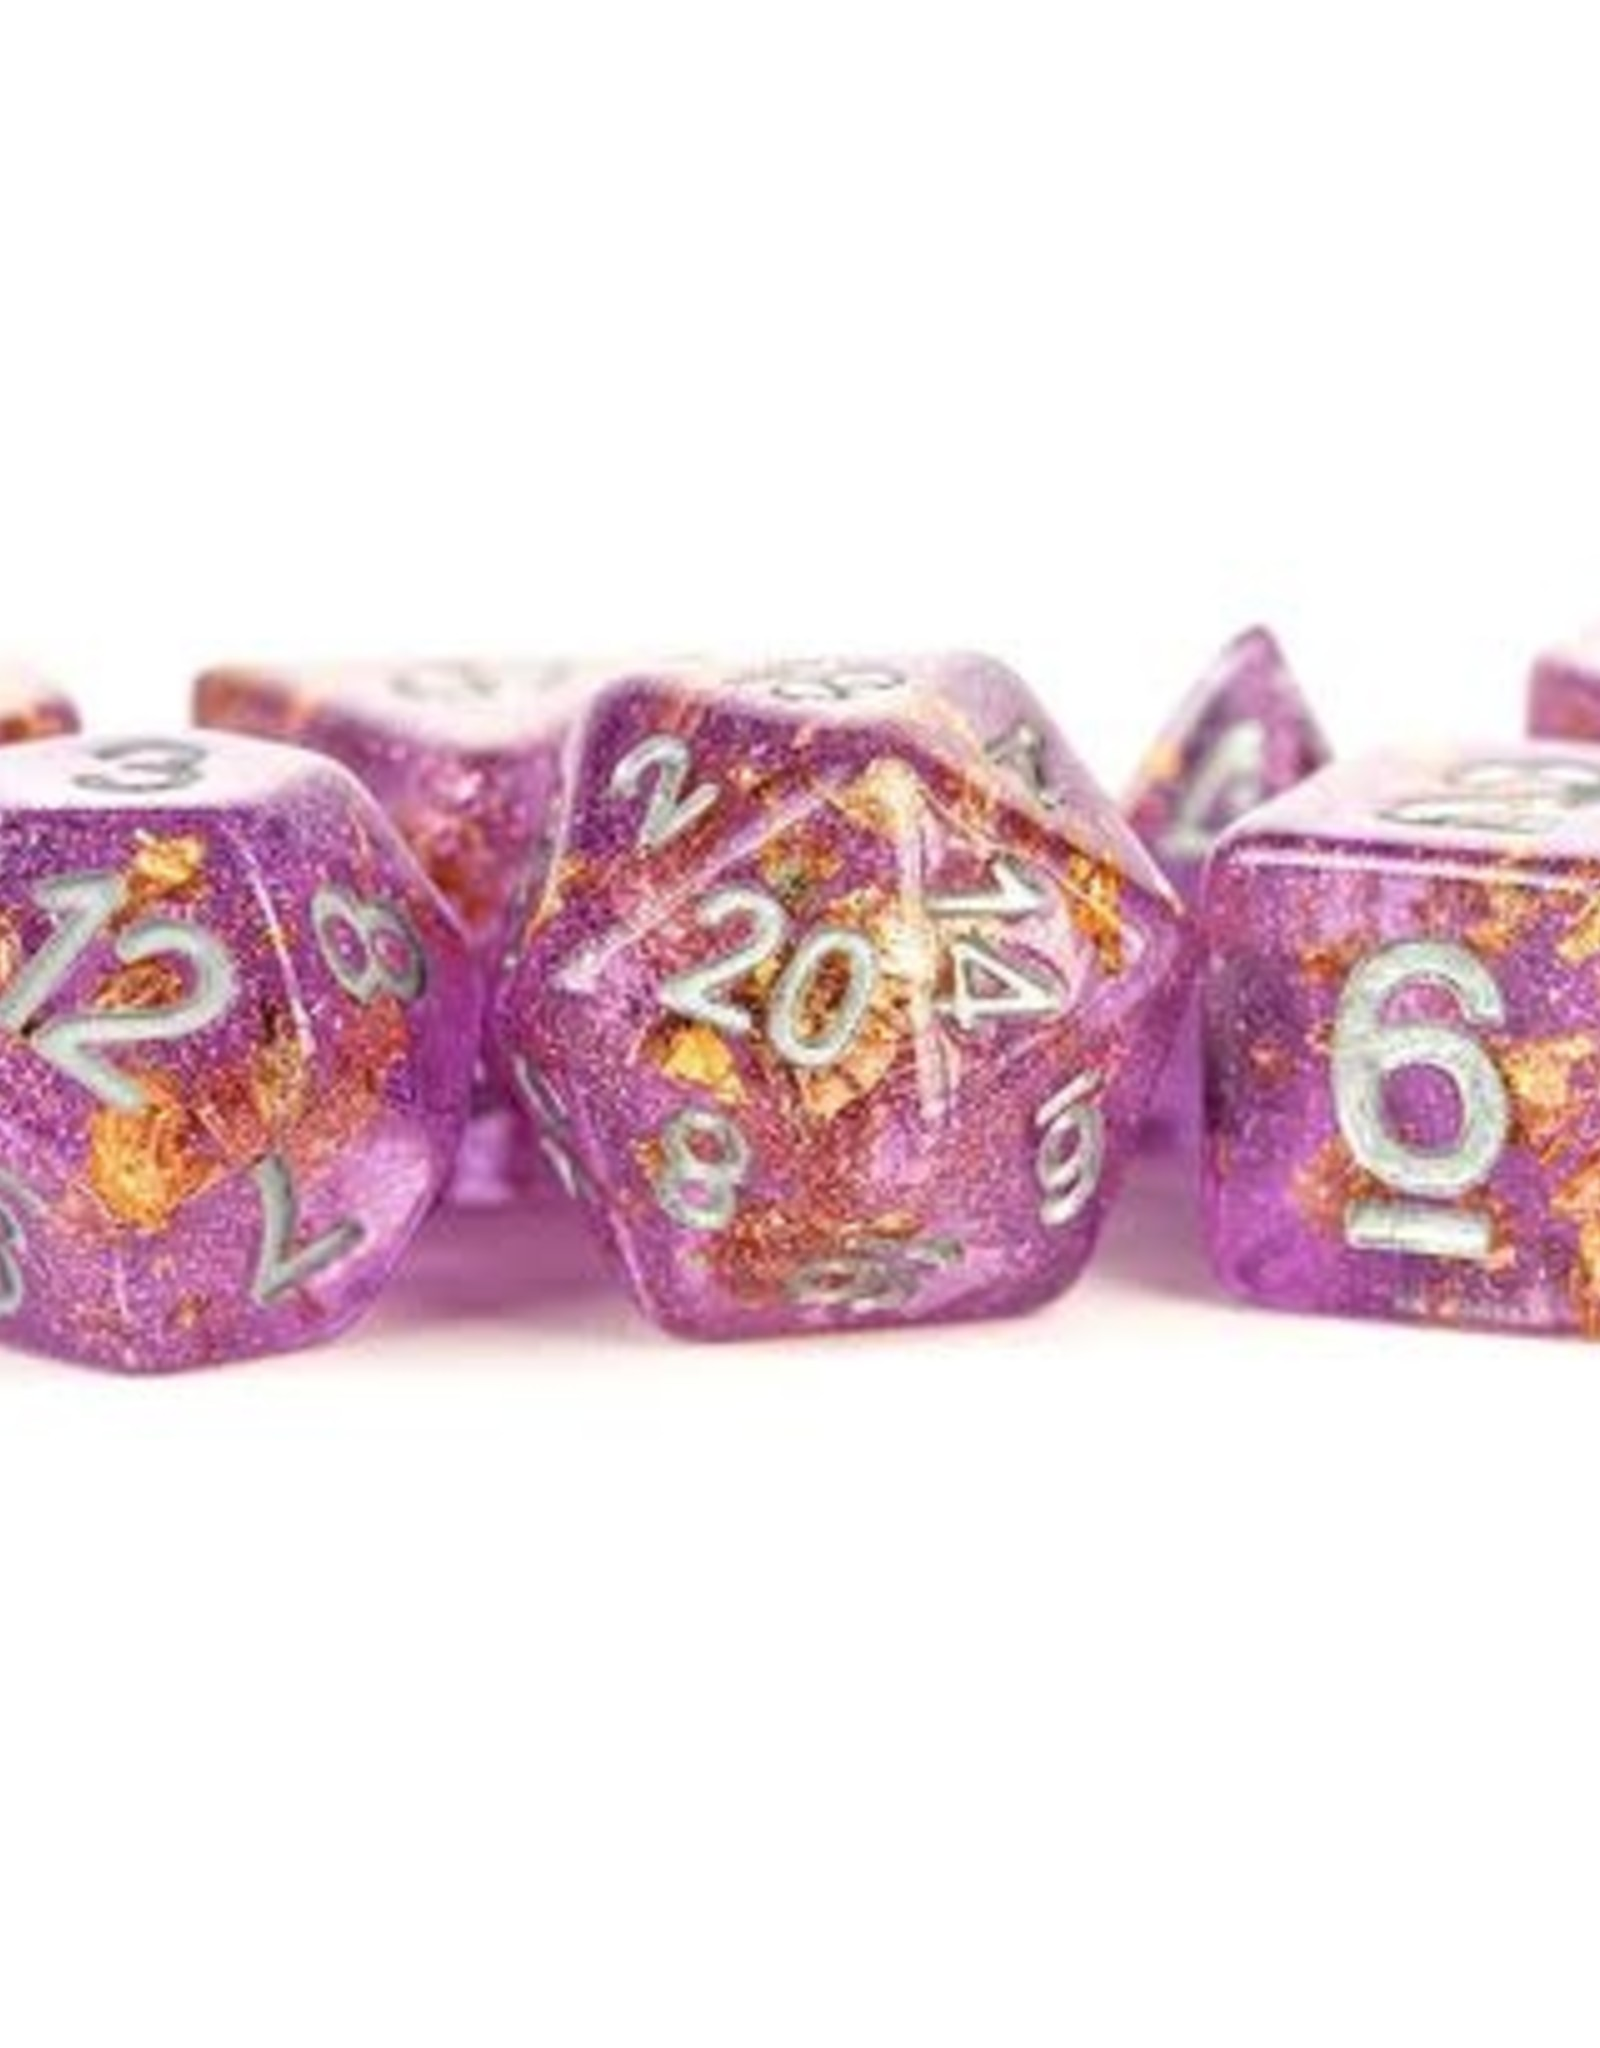 Metallic Dice Games Poly Set Dice Purple w/ Gold Foil